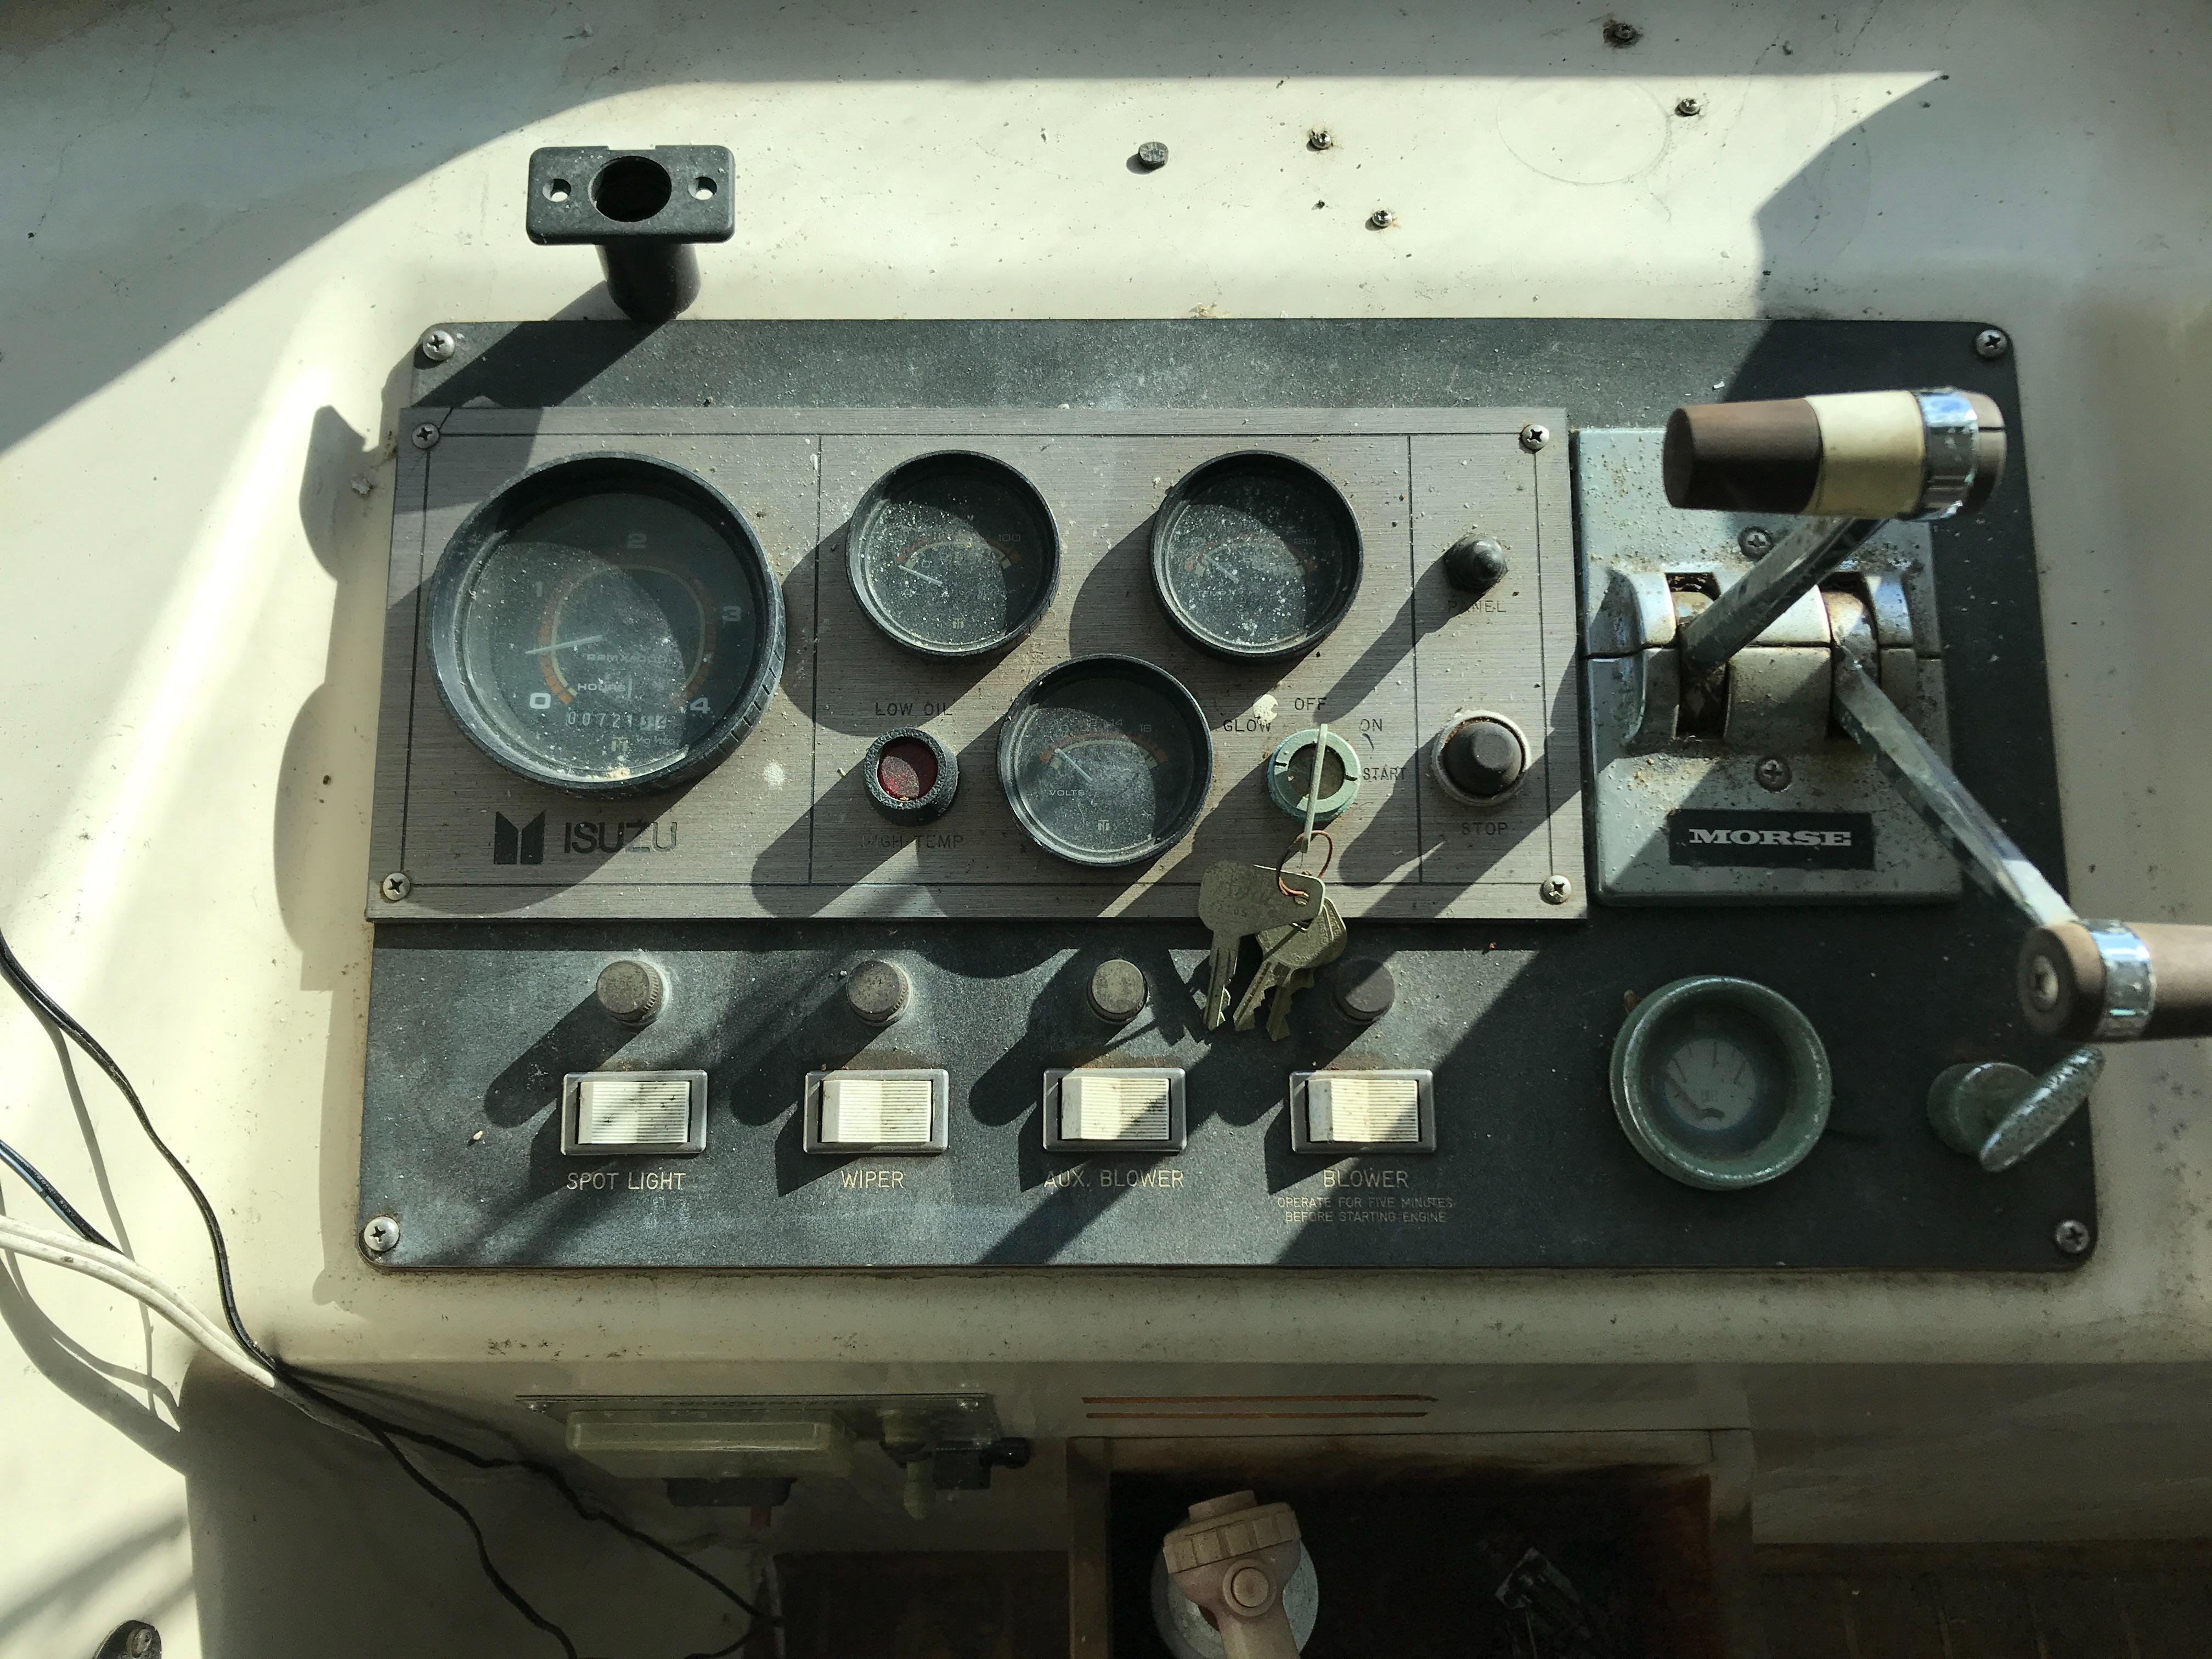 Carri-craft 57 Catamaran - starboard engine controls